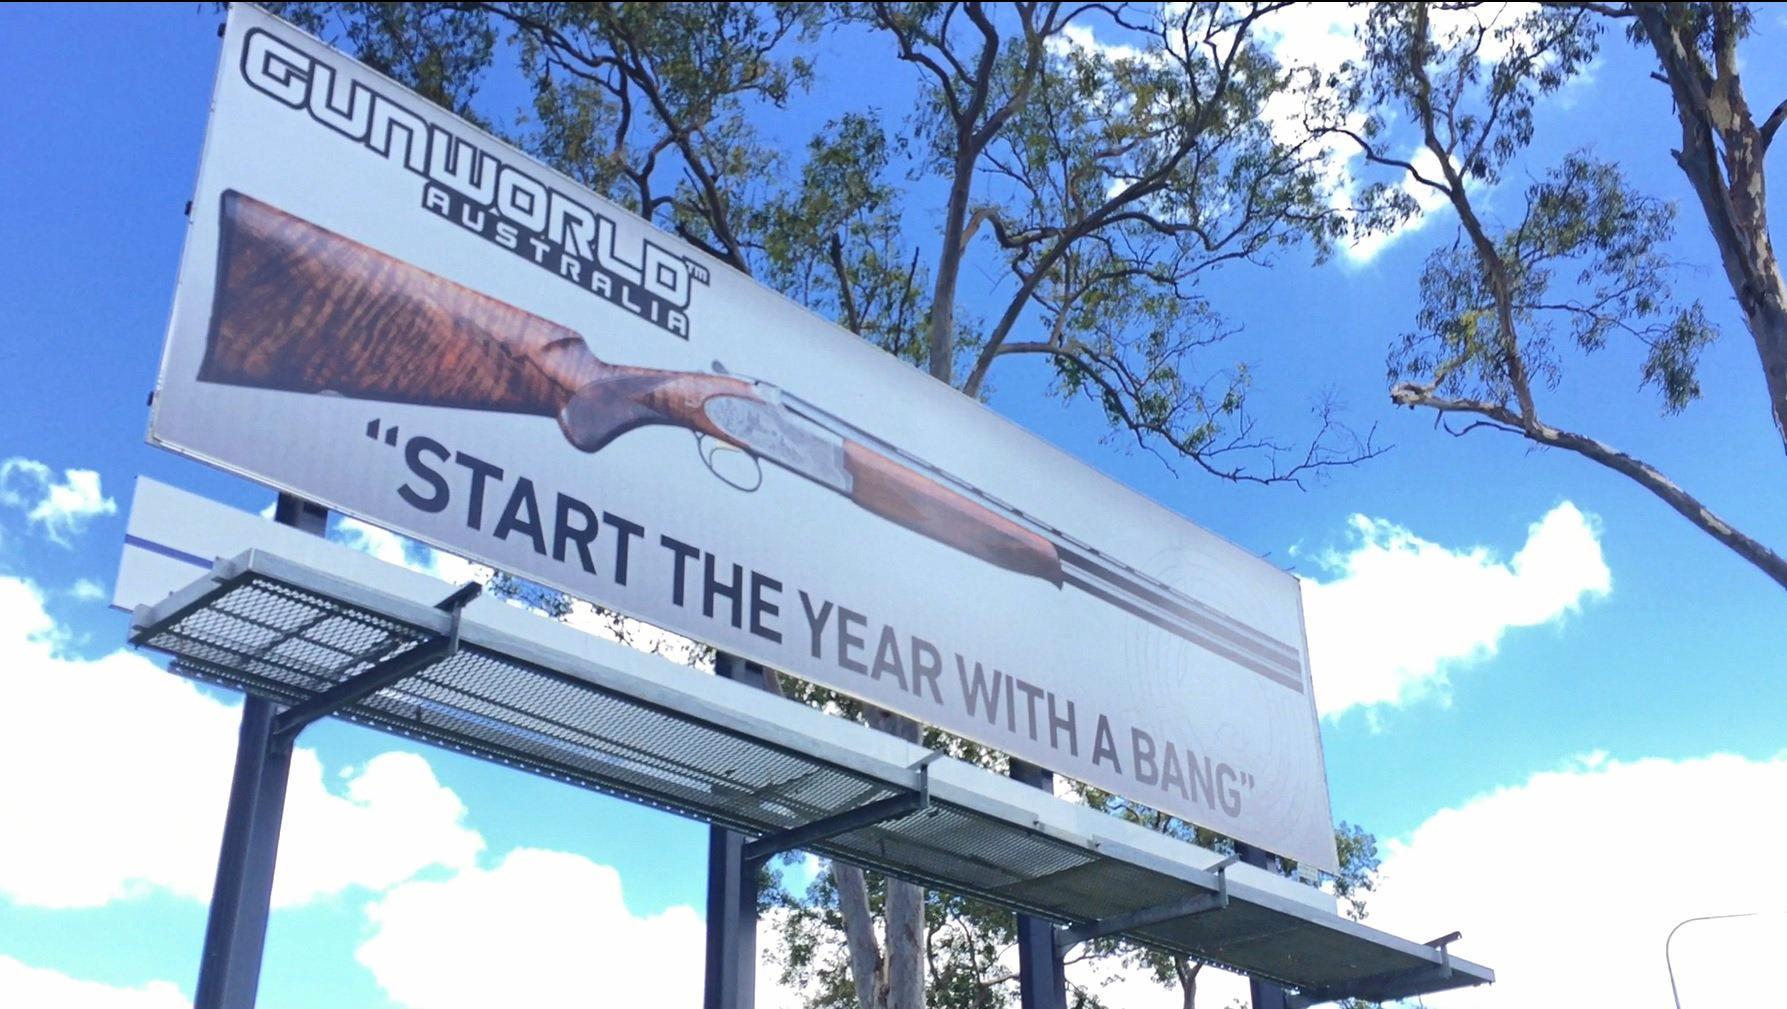 Gun World Australia sign outside Gympie.